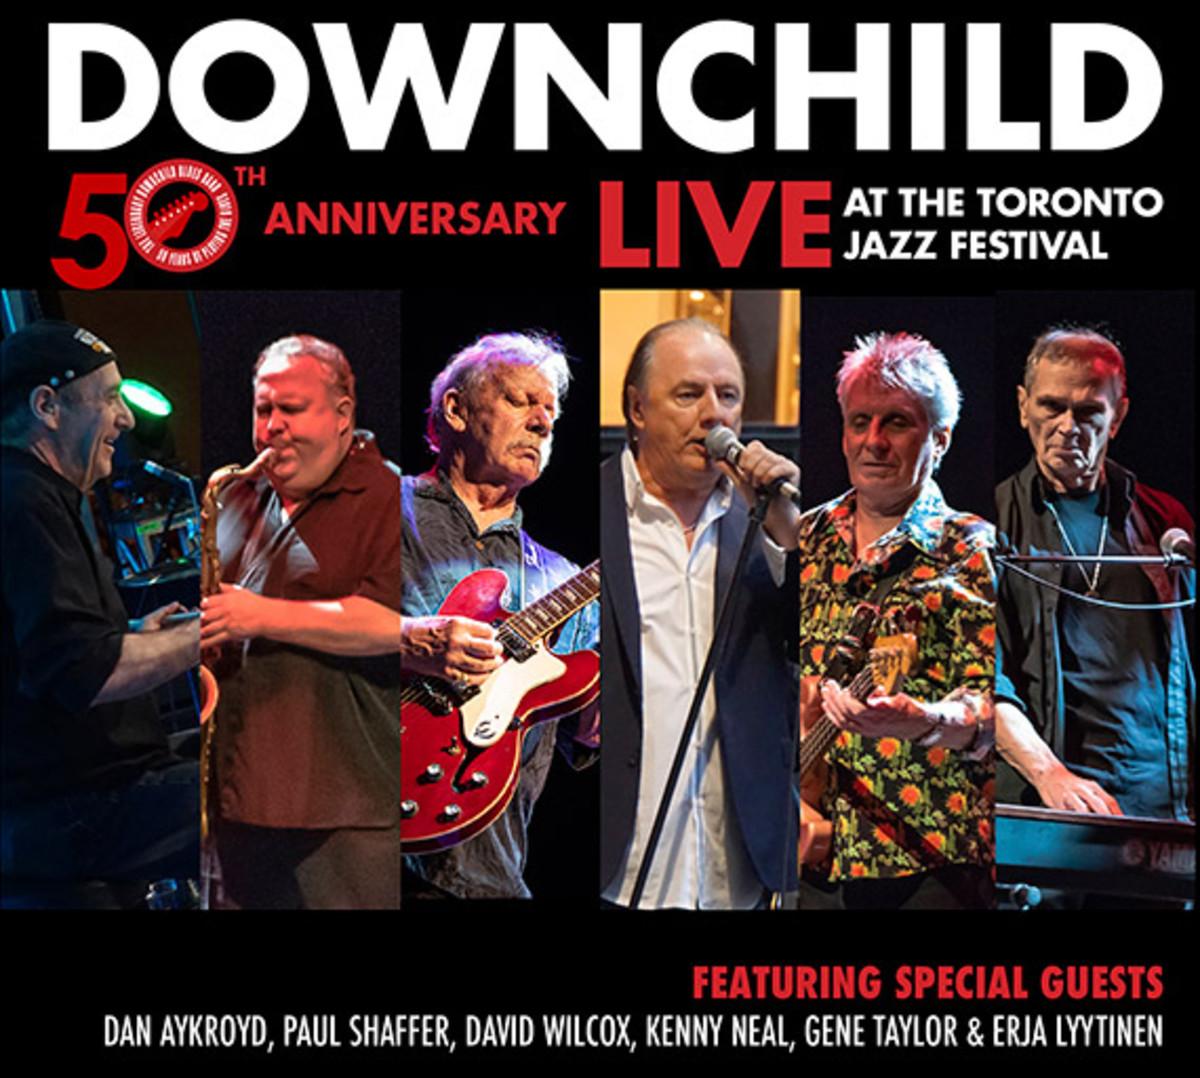 Downchild-50th-Anniversary-Live